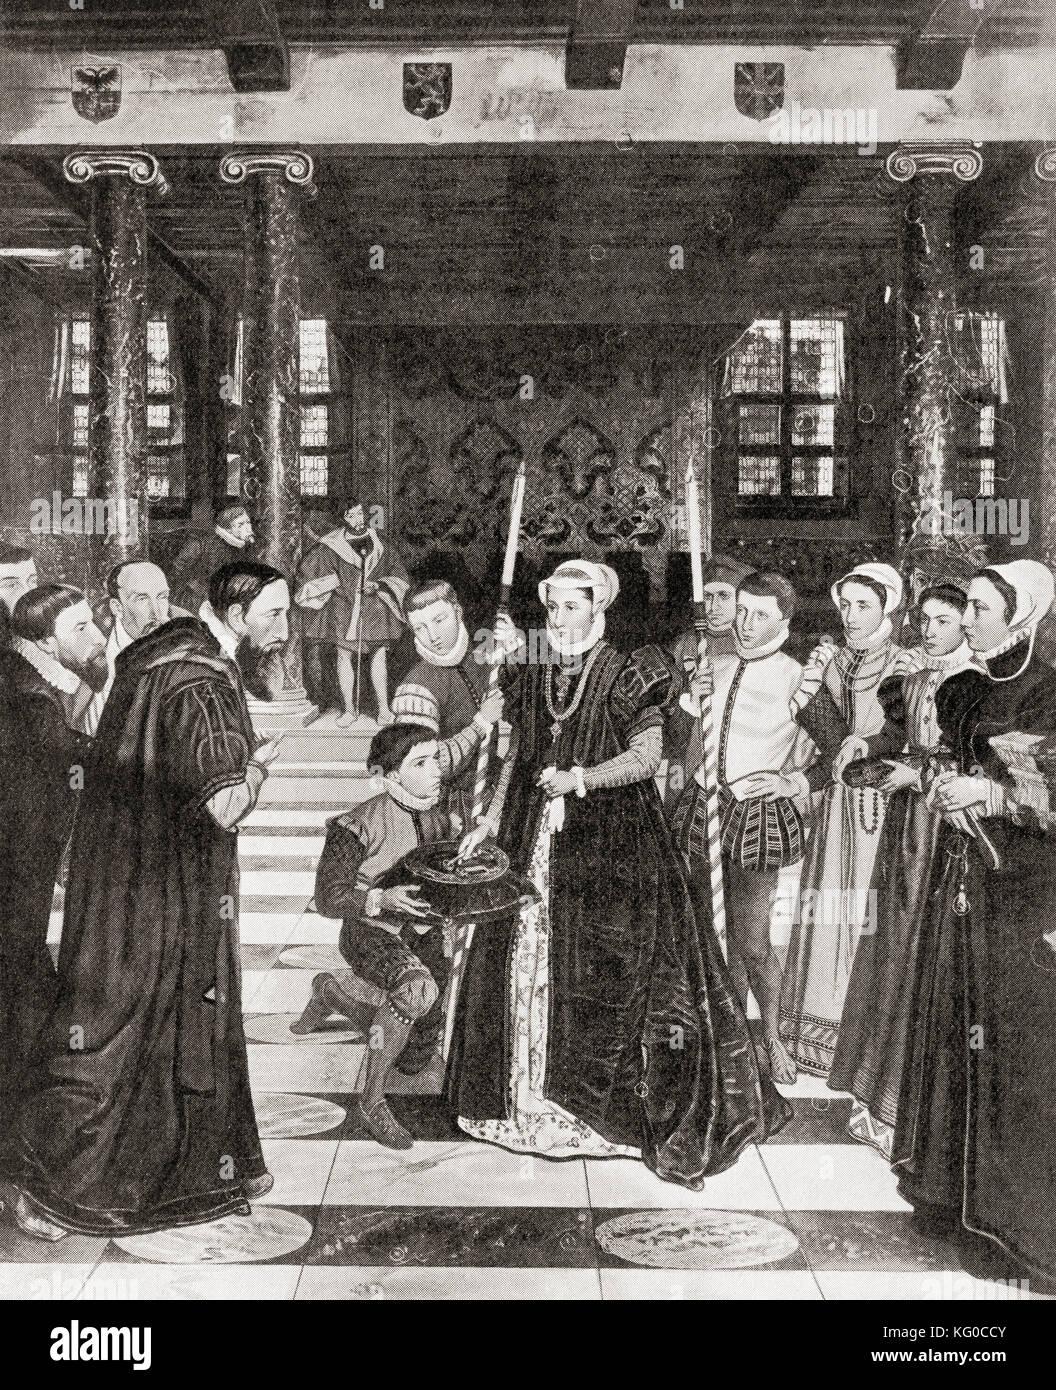 Margherita di parma date le chiavi di Anversa, Belgio, 1559. Margherita di Parma, 1522 - 1586. governatore dei Paesi Immagini Stock